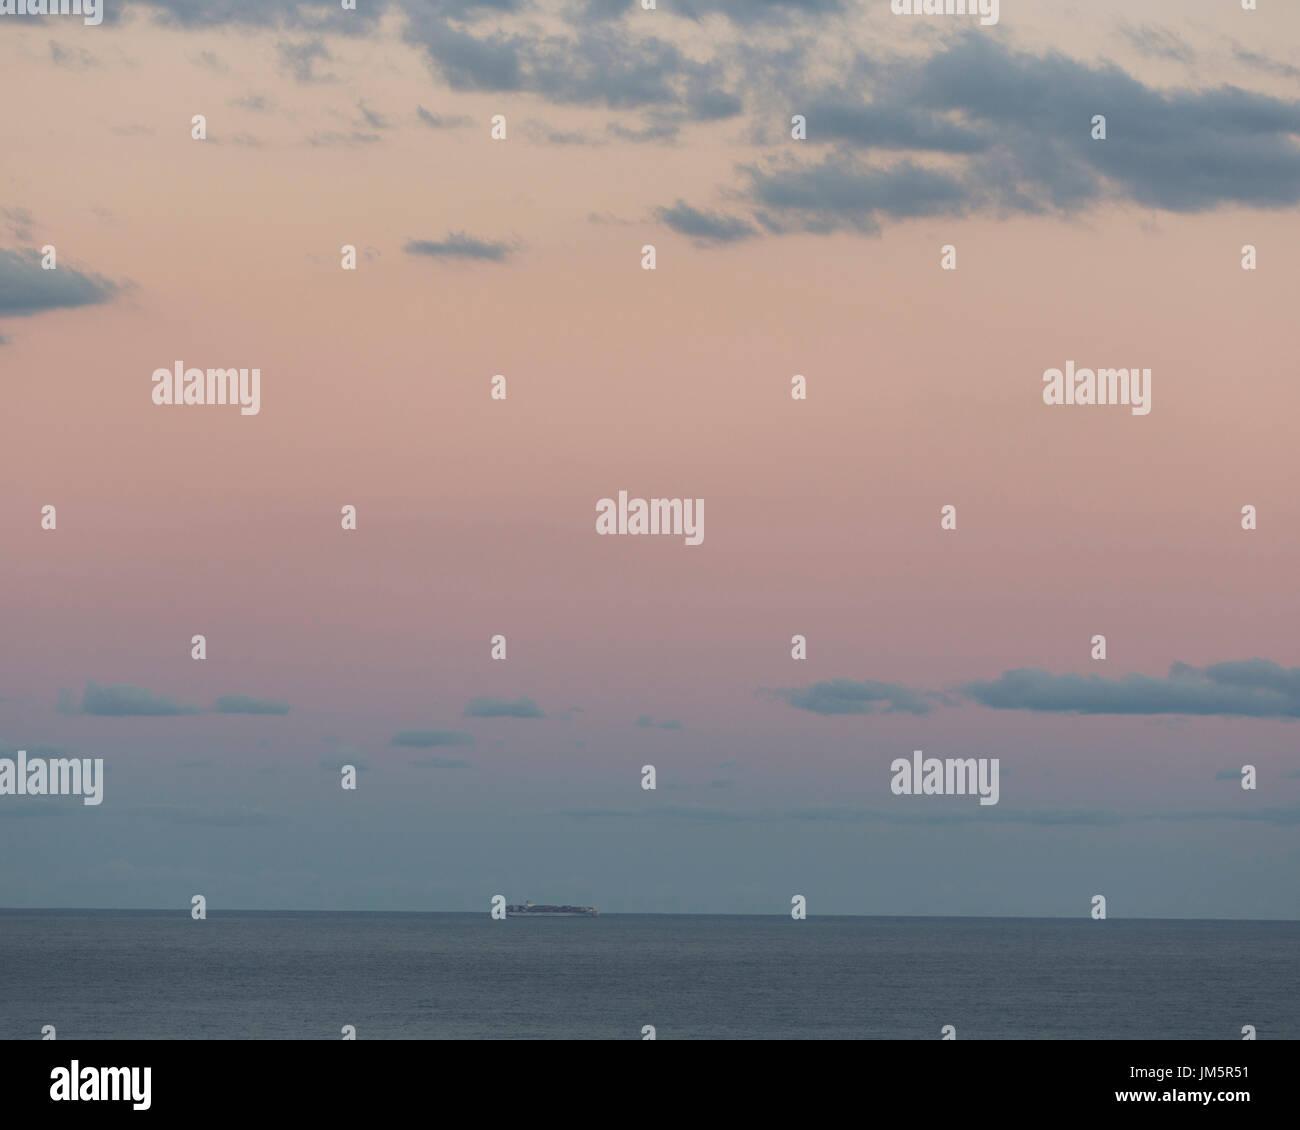 skyline sky skies digital overlay stock photo 150103997 alamy